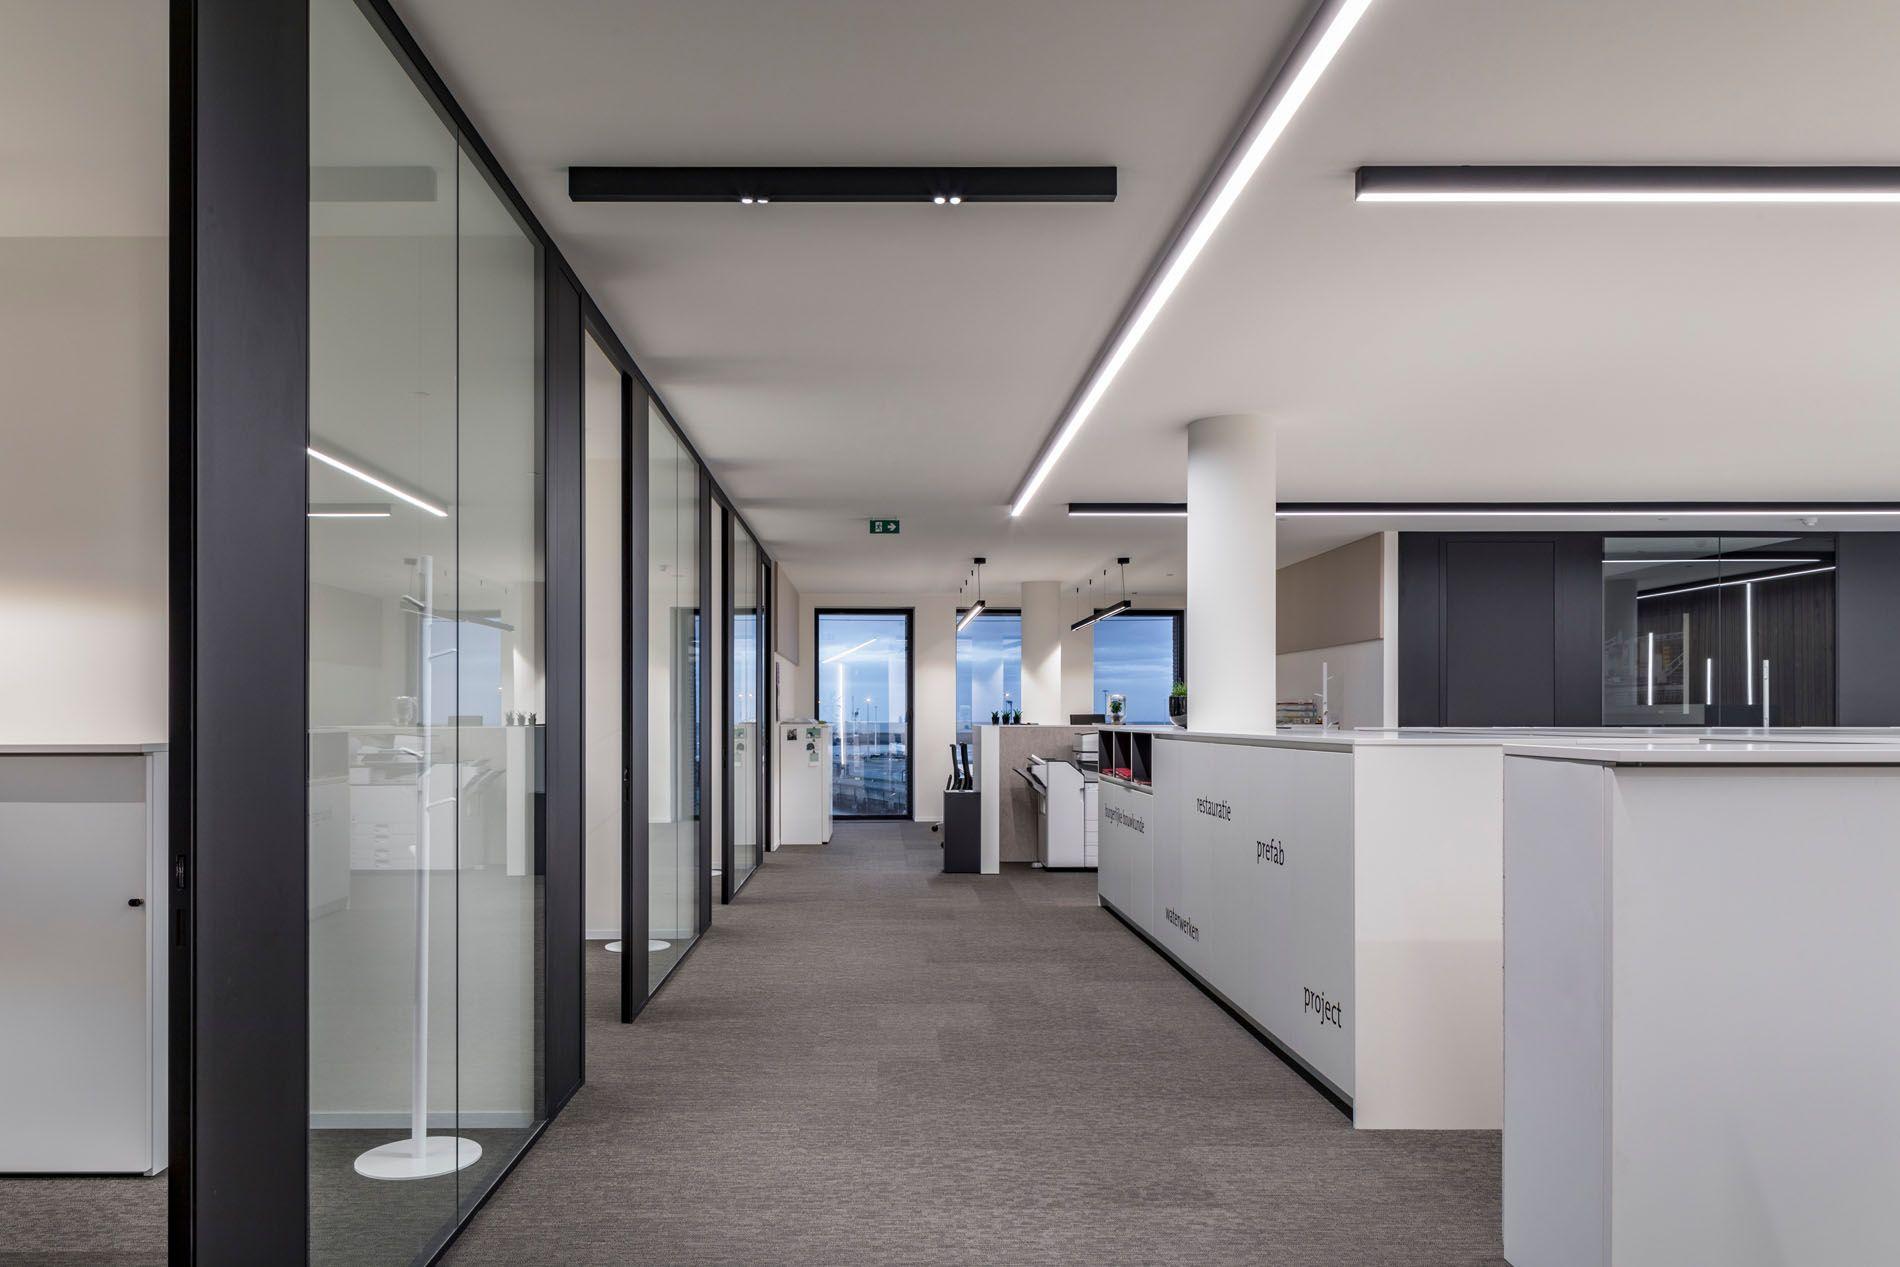 Office Lighting Ideas With Sld50 Zeebrugge Modern Office Lighting Office Lighting Design Office Lighting